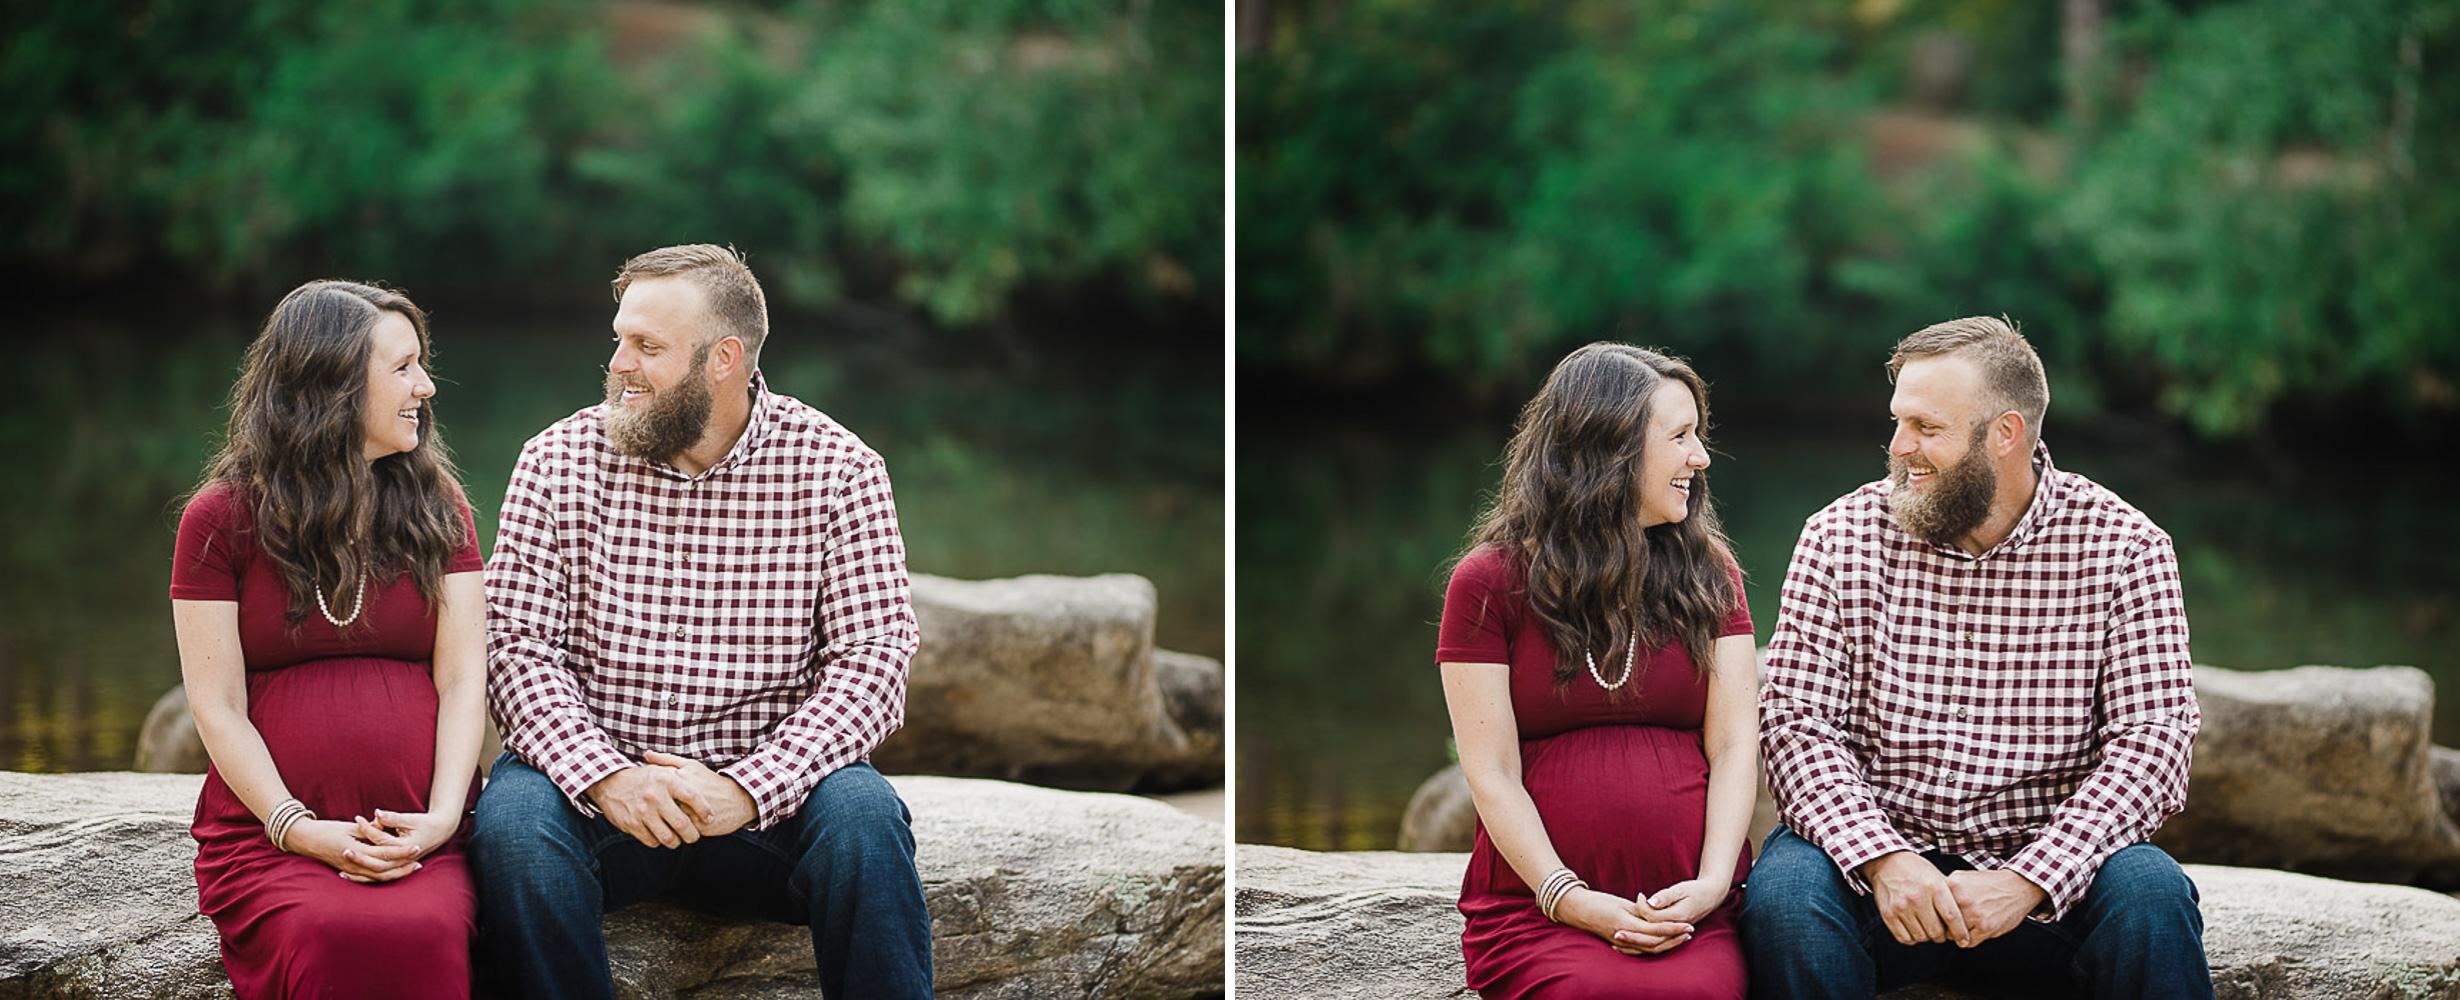 Maternity Portraits, River Maternity Portraits, Summer Mast Photography, Baby Bump 07.jpg